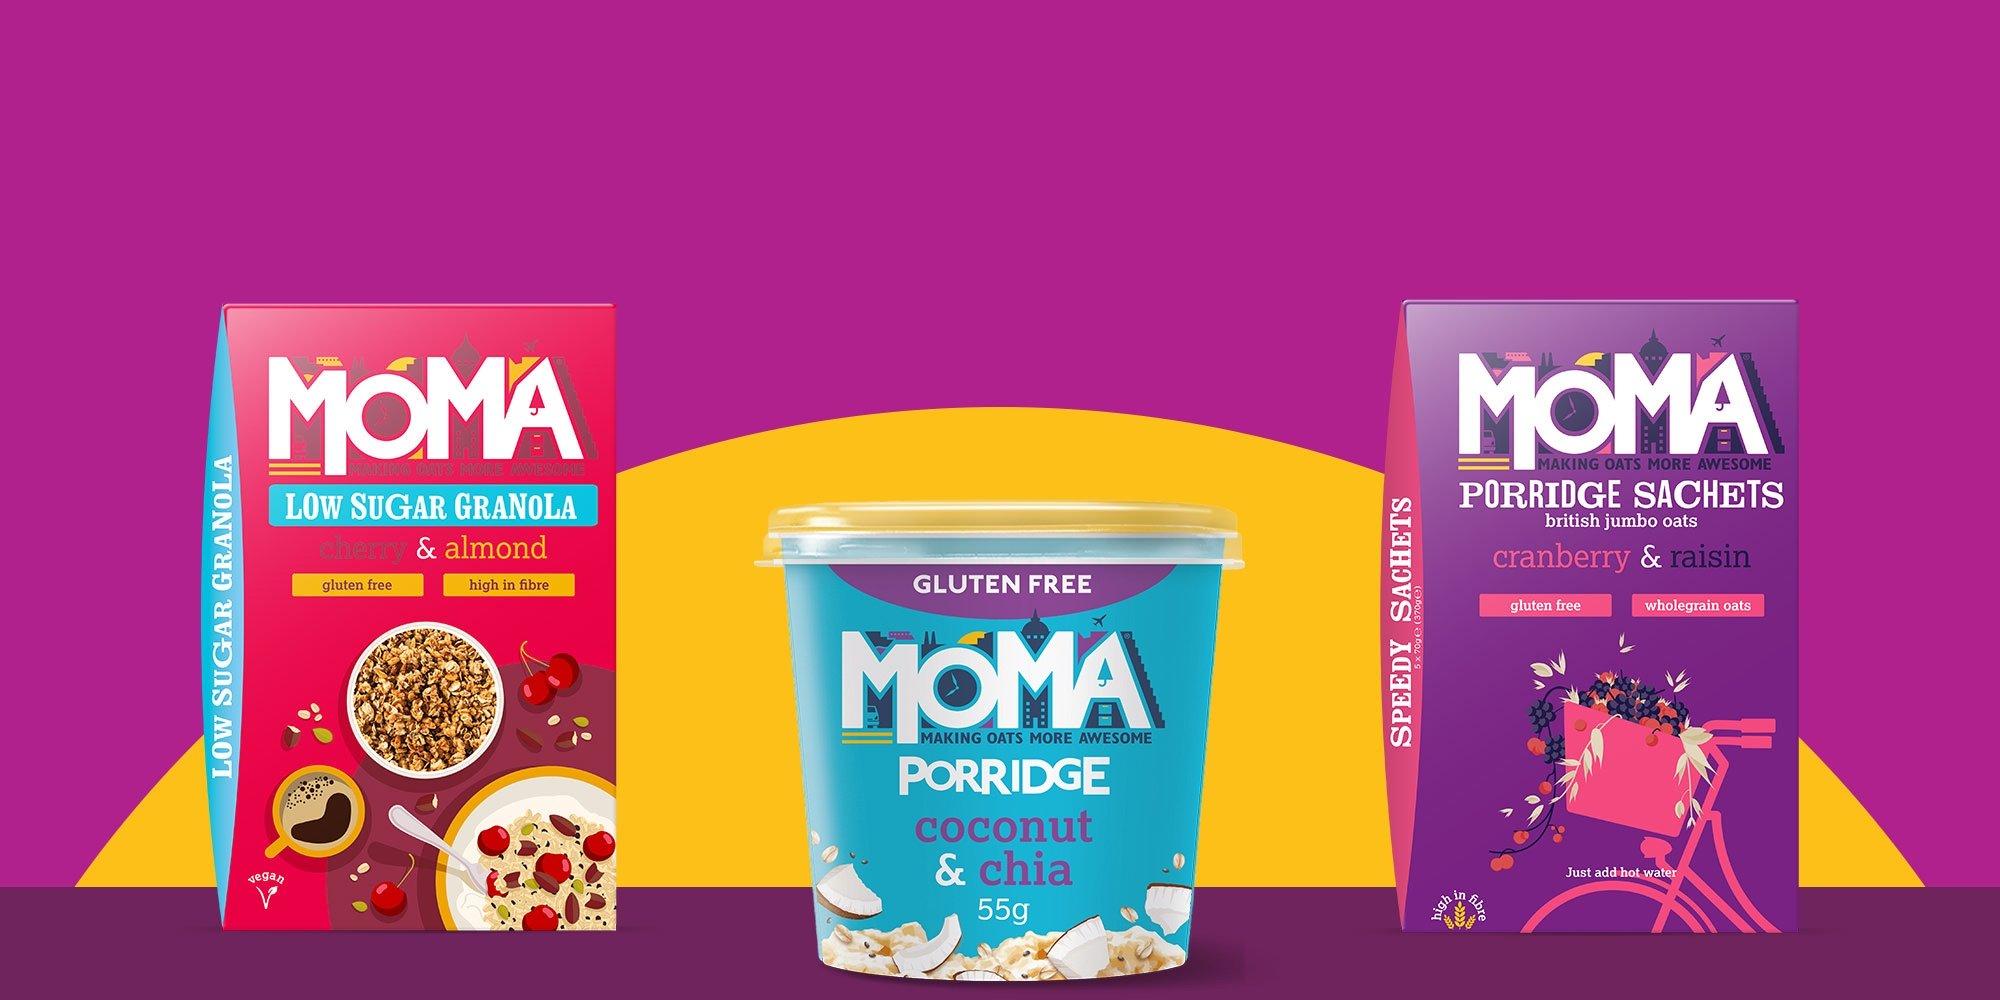 MOMA Granola & Porridge